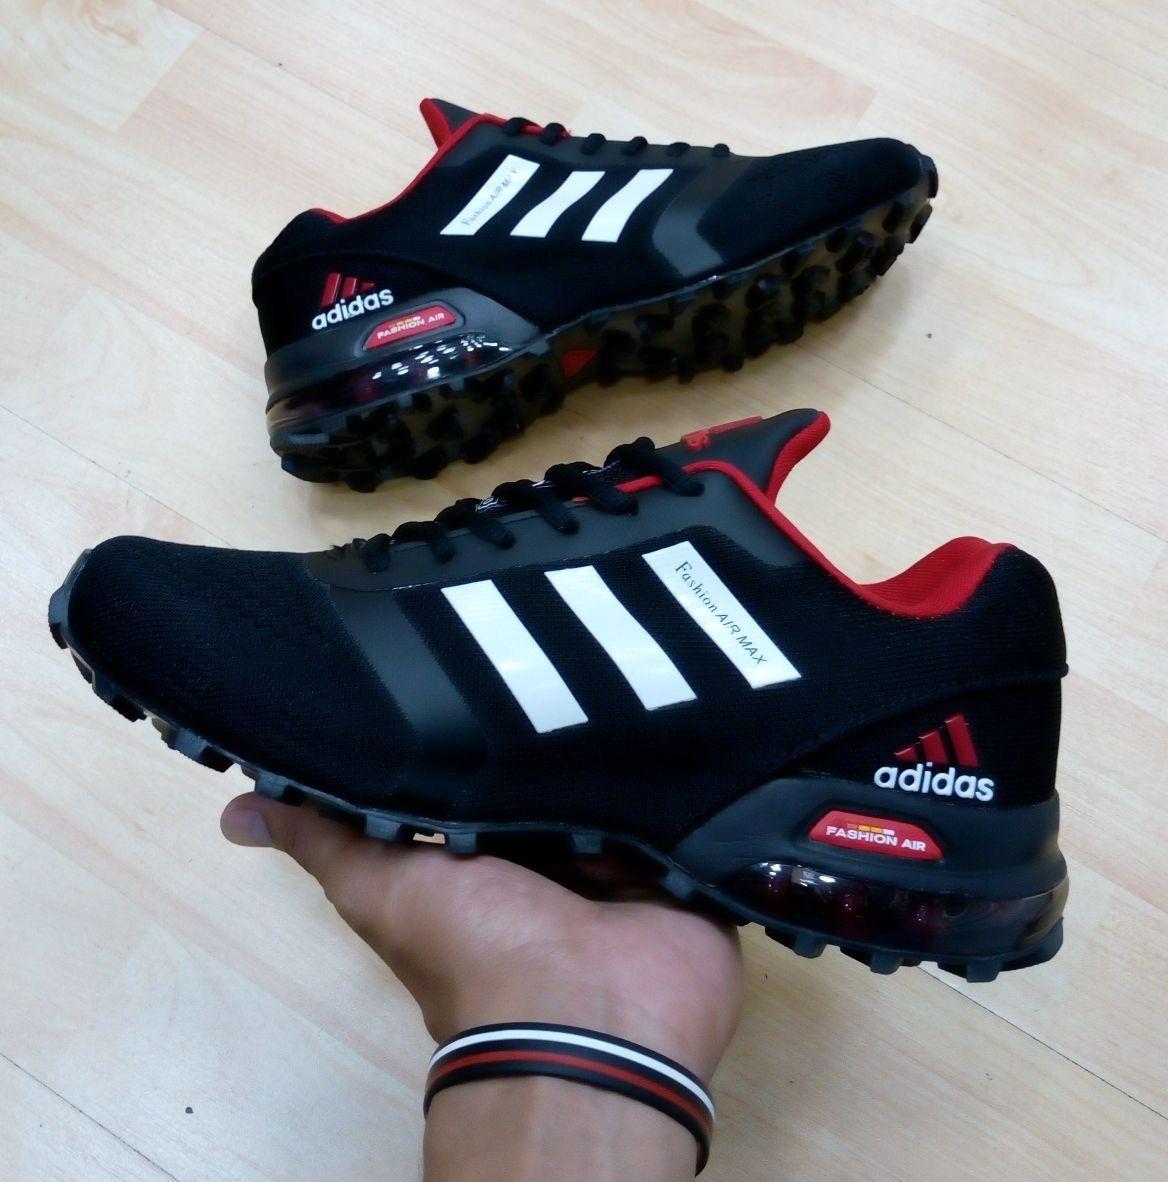 size 40 81ad2 0774b Tenis adidas Fashion Air Max Negras Con Rojo, Zapatillas.